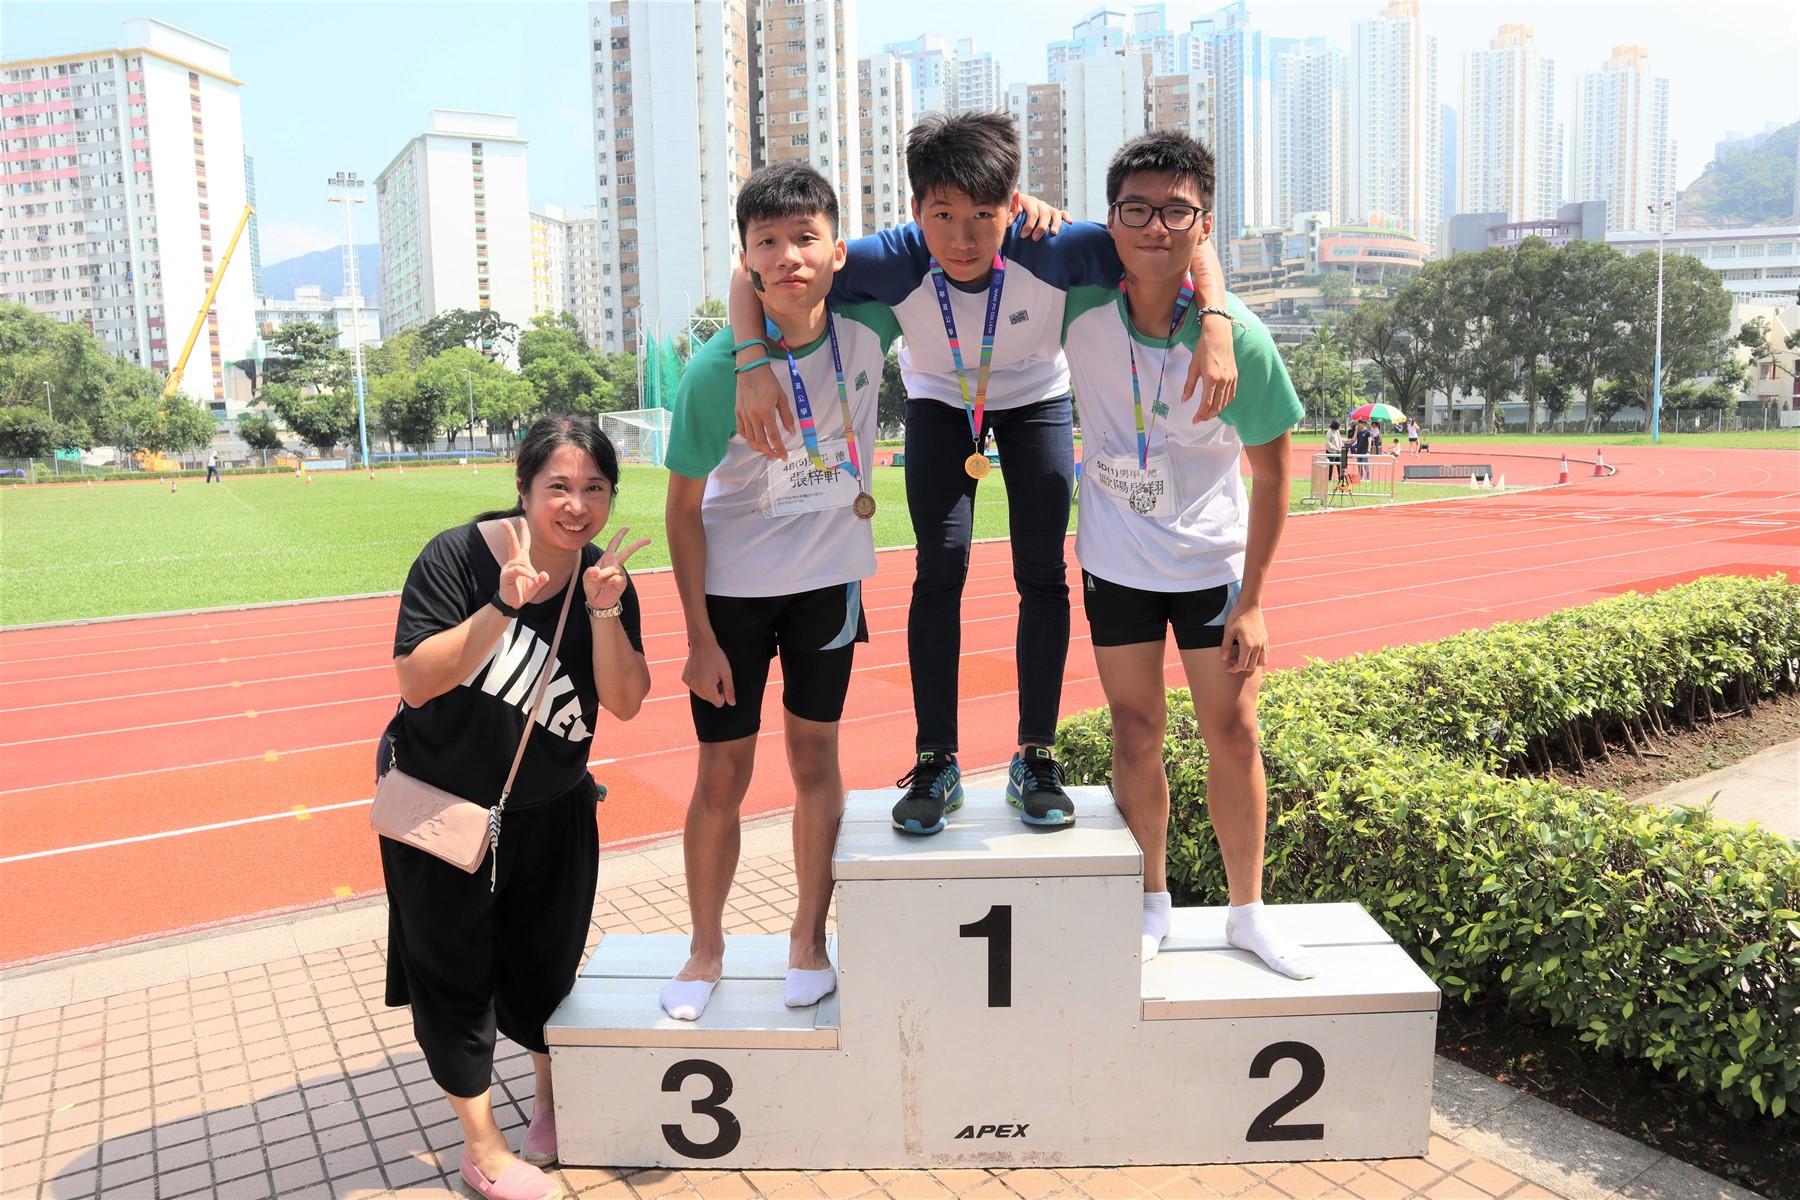 https://www.npc.edu.hk/sites/default/files/img_9375.jpg